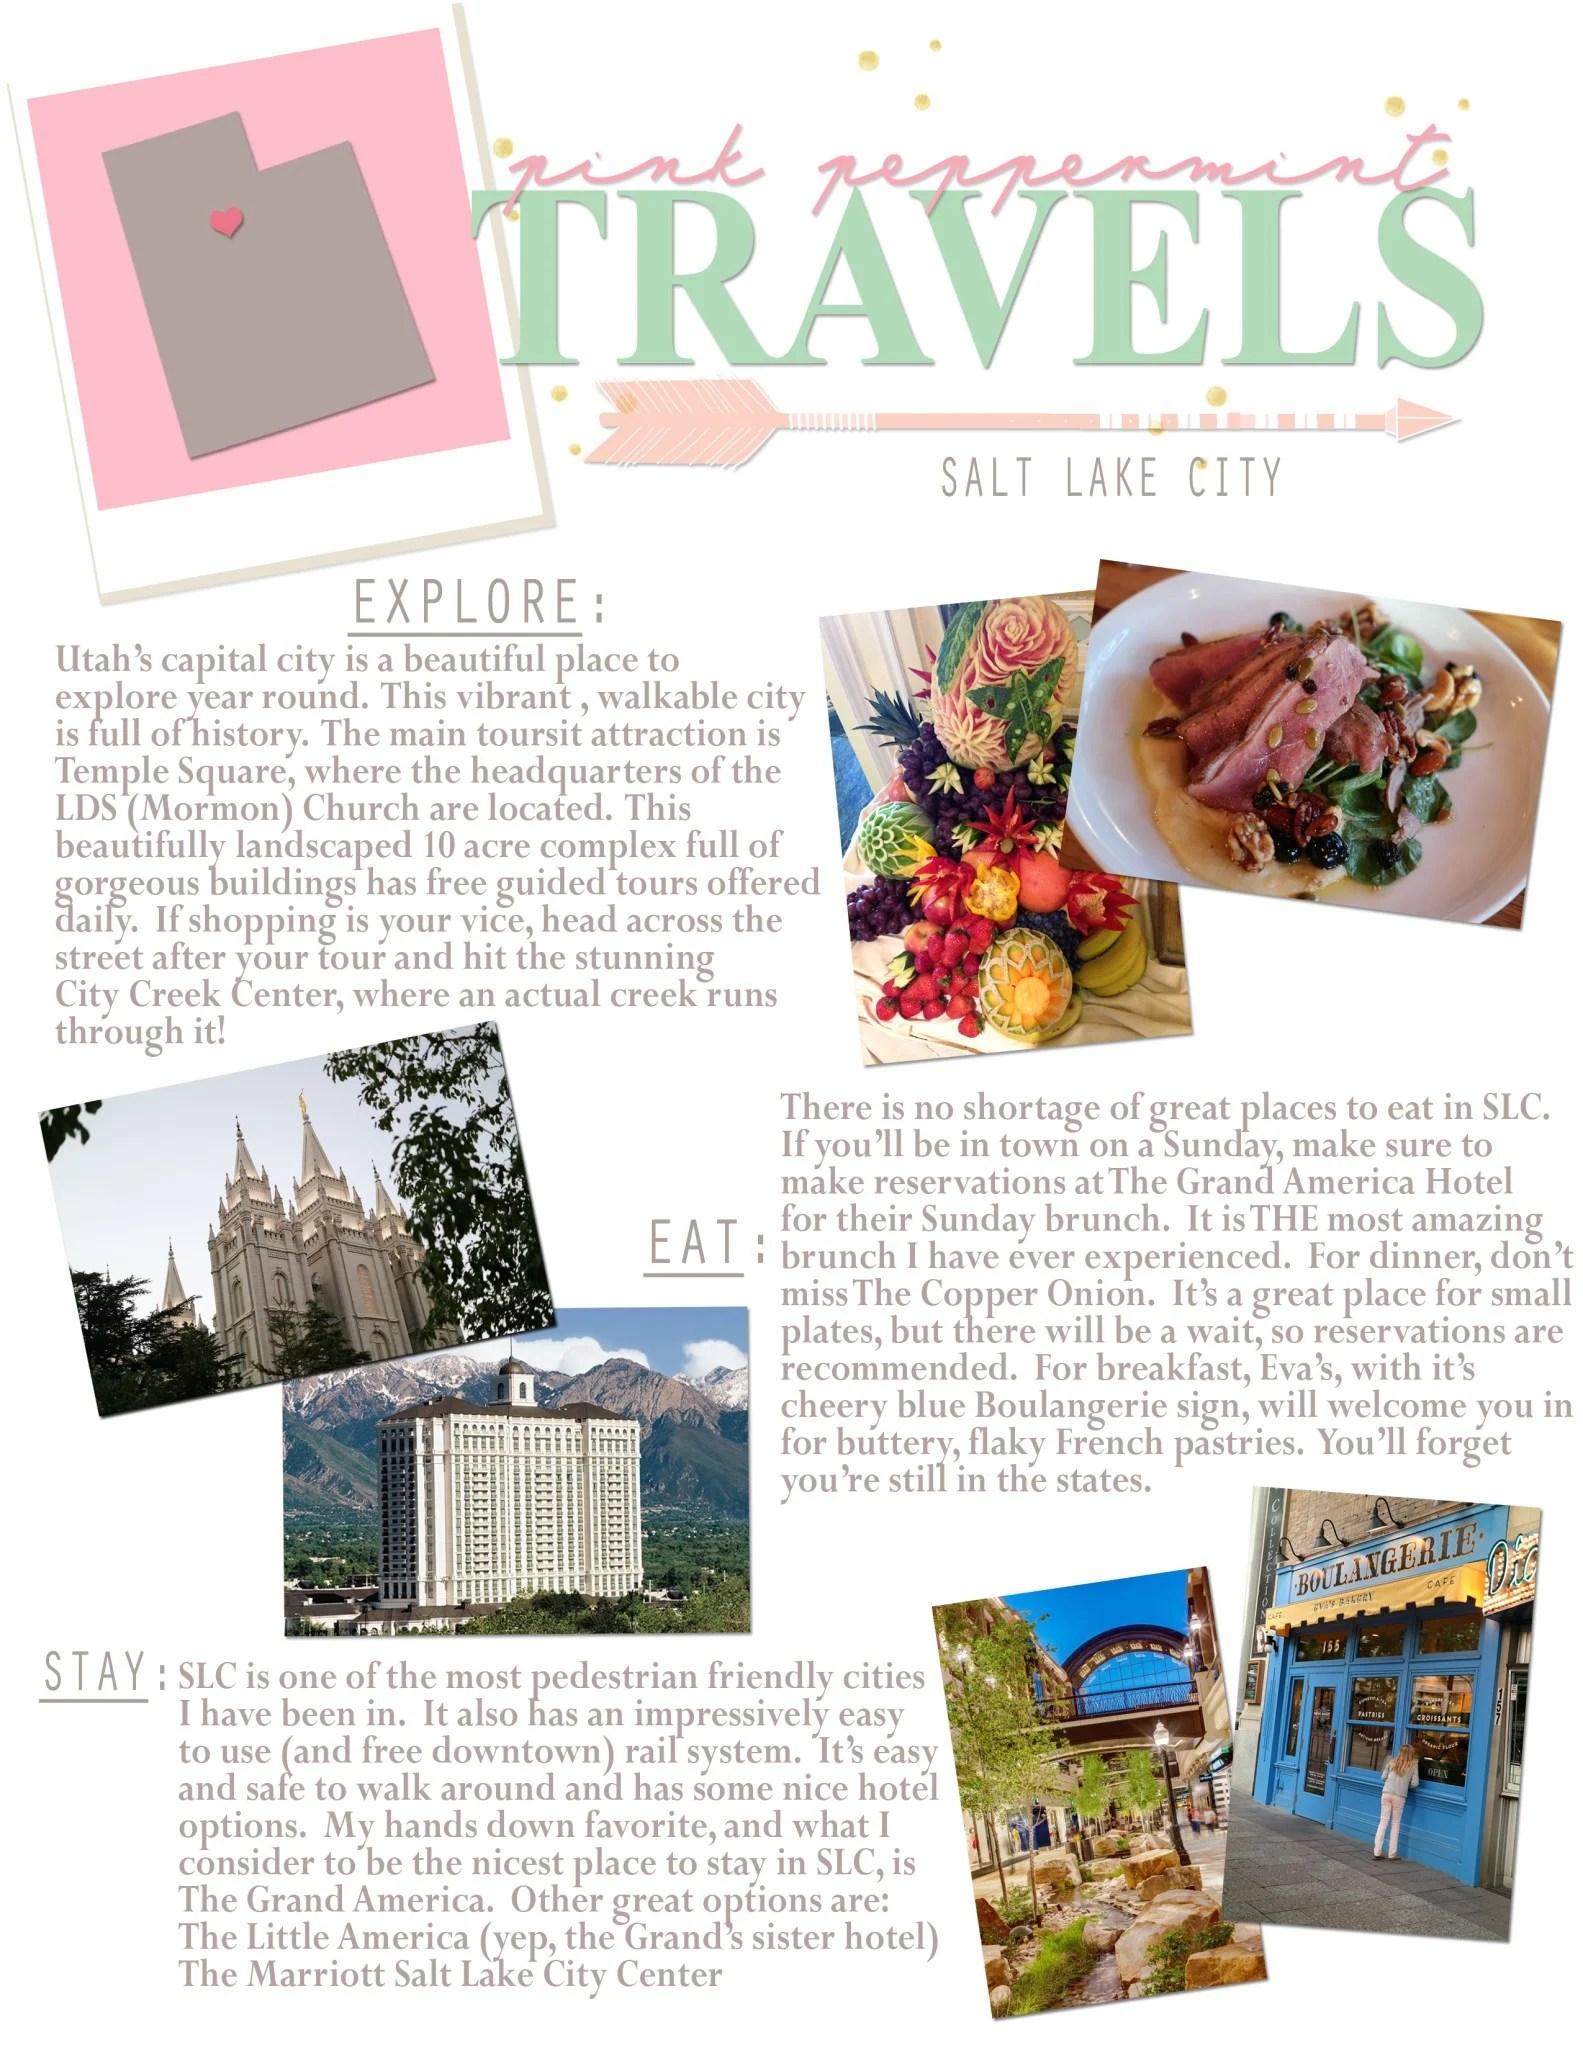 Pink Peppermint Travels: Salt Lake City, UT Travel Guide